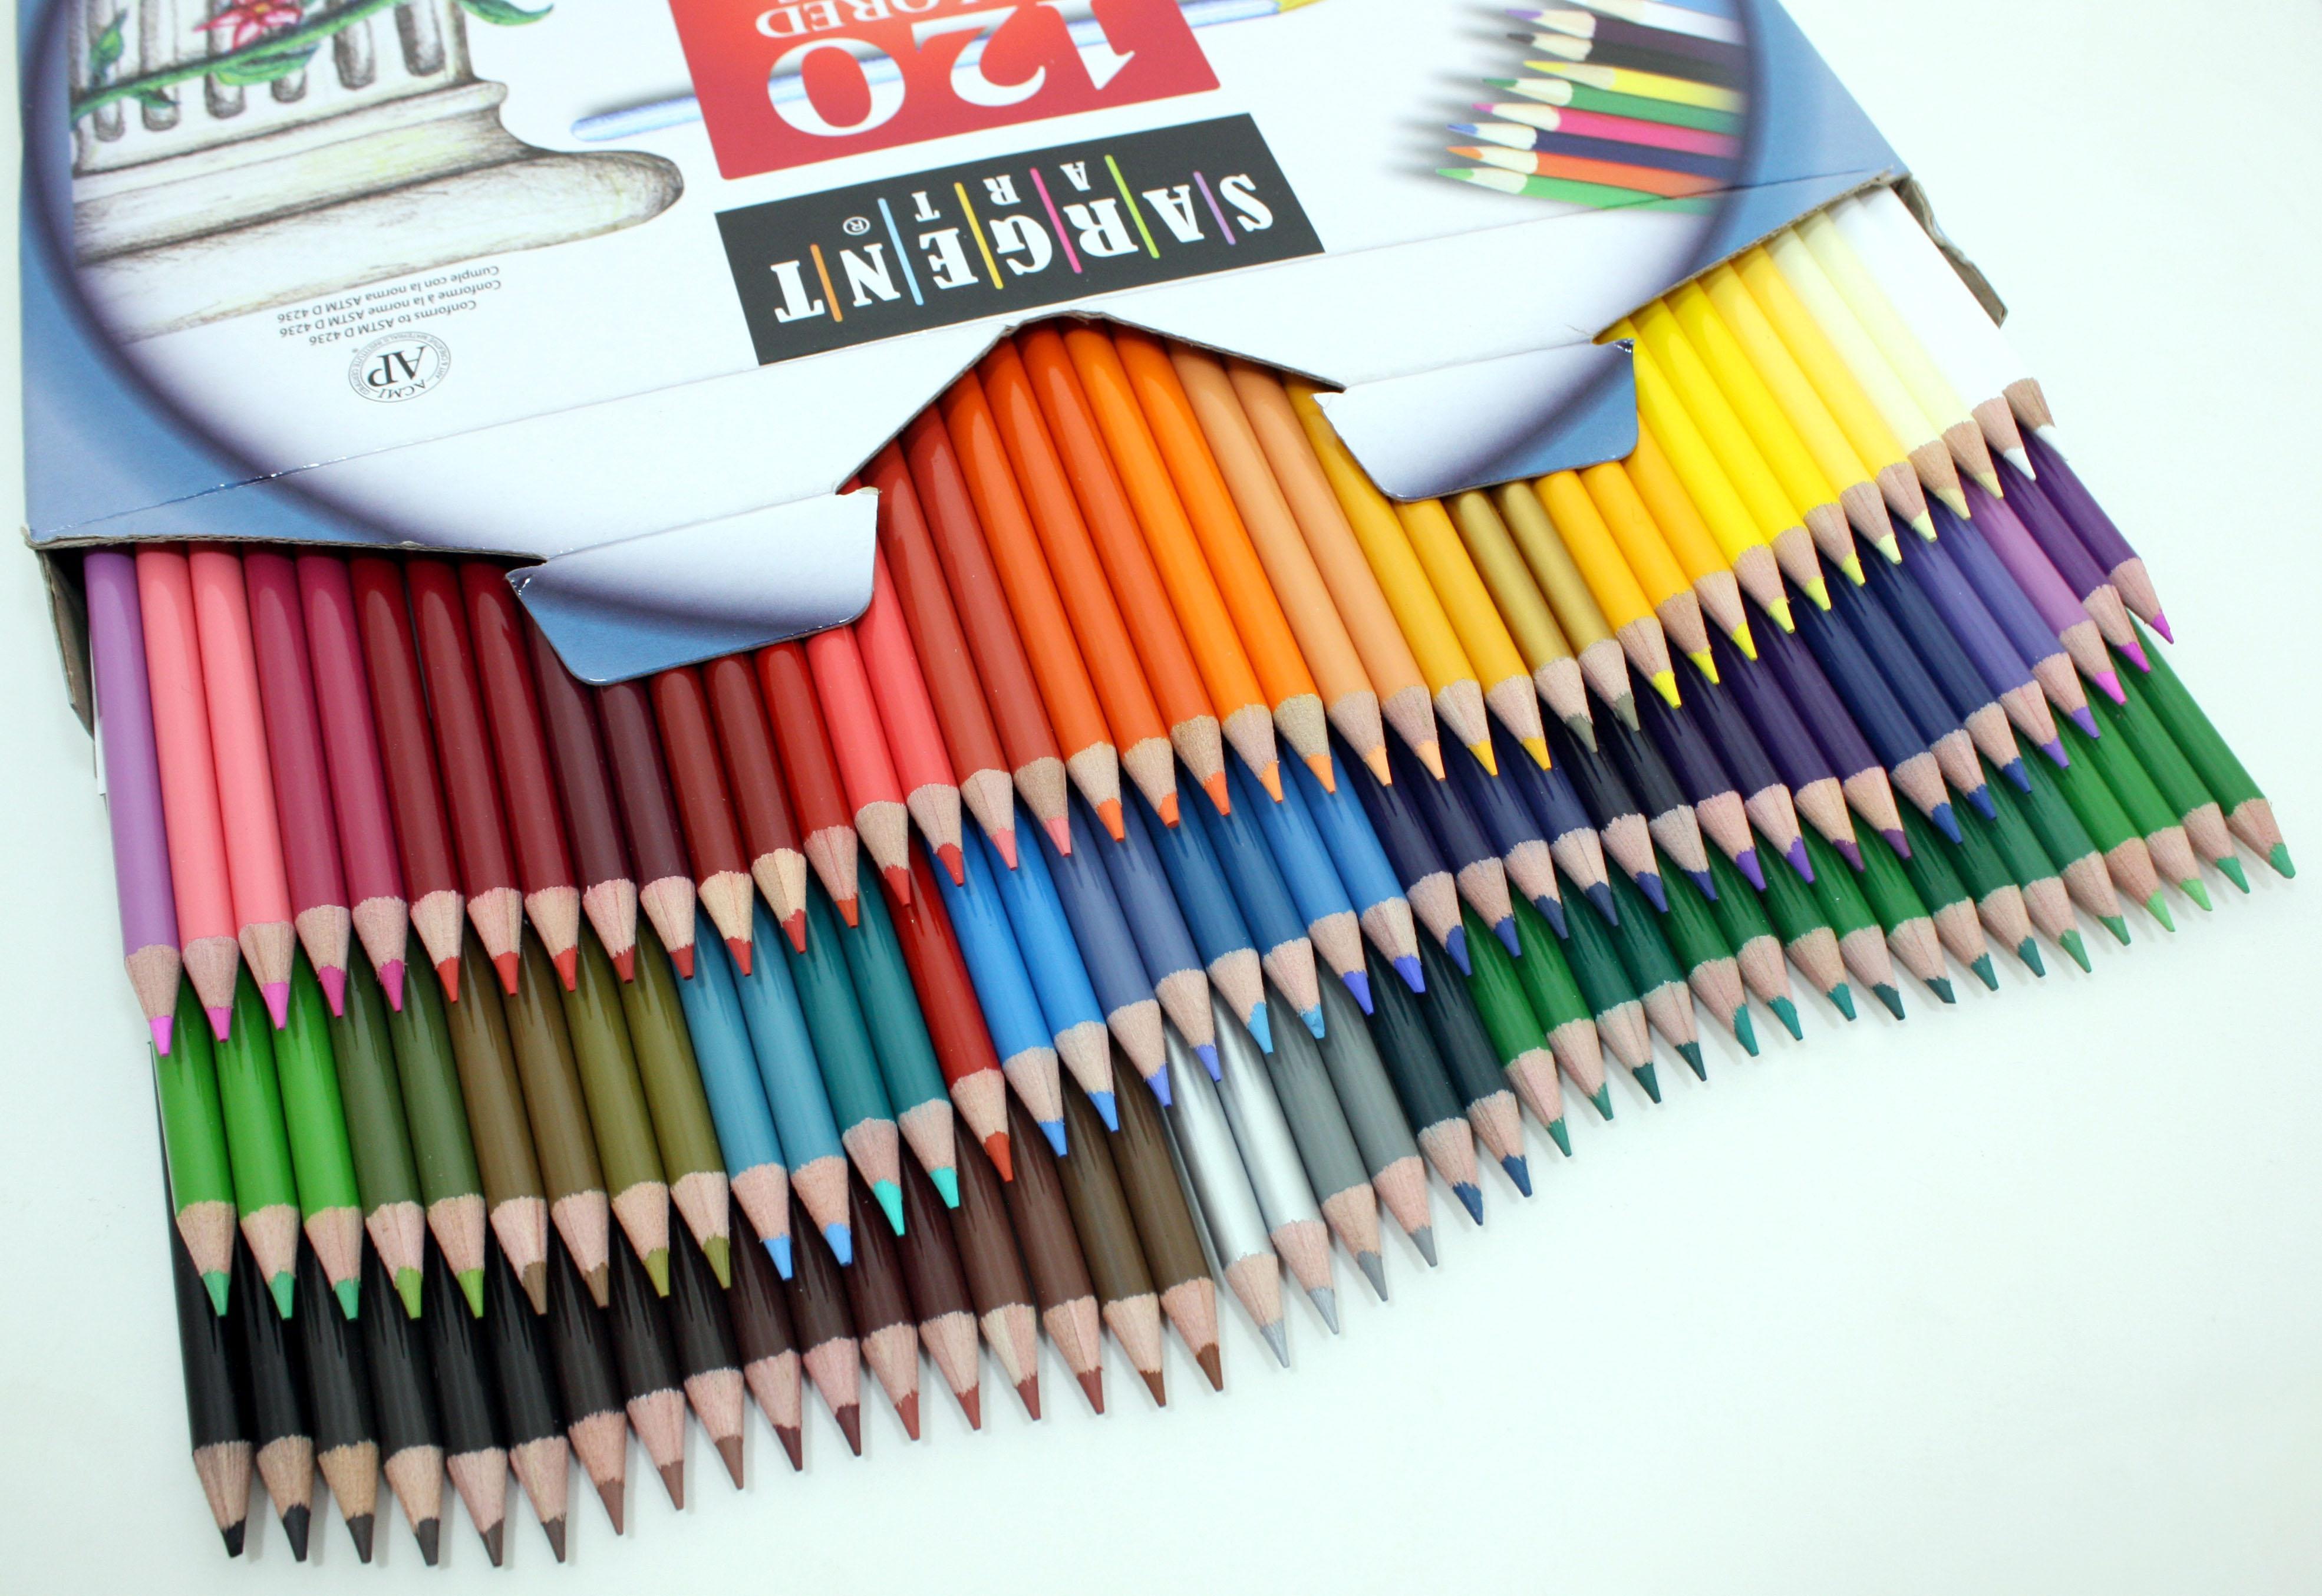 sargent art 22 7252 120 count best buy assortment colored pencils arts crafts sewing. Black Bedroom Furniture Sets. Home Design Ideas